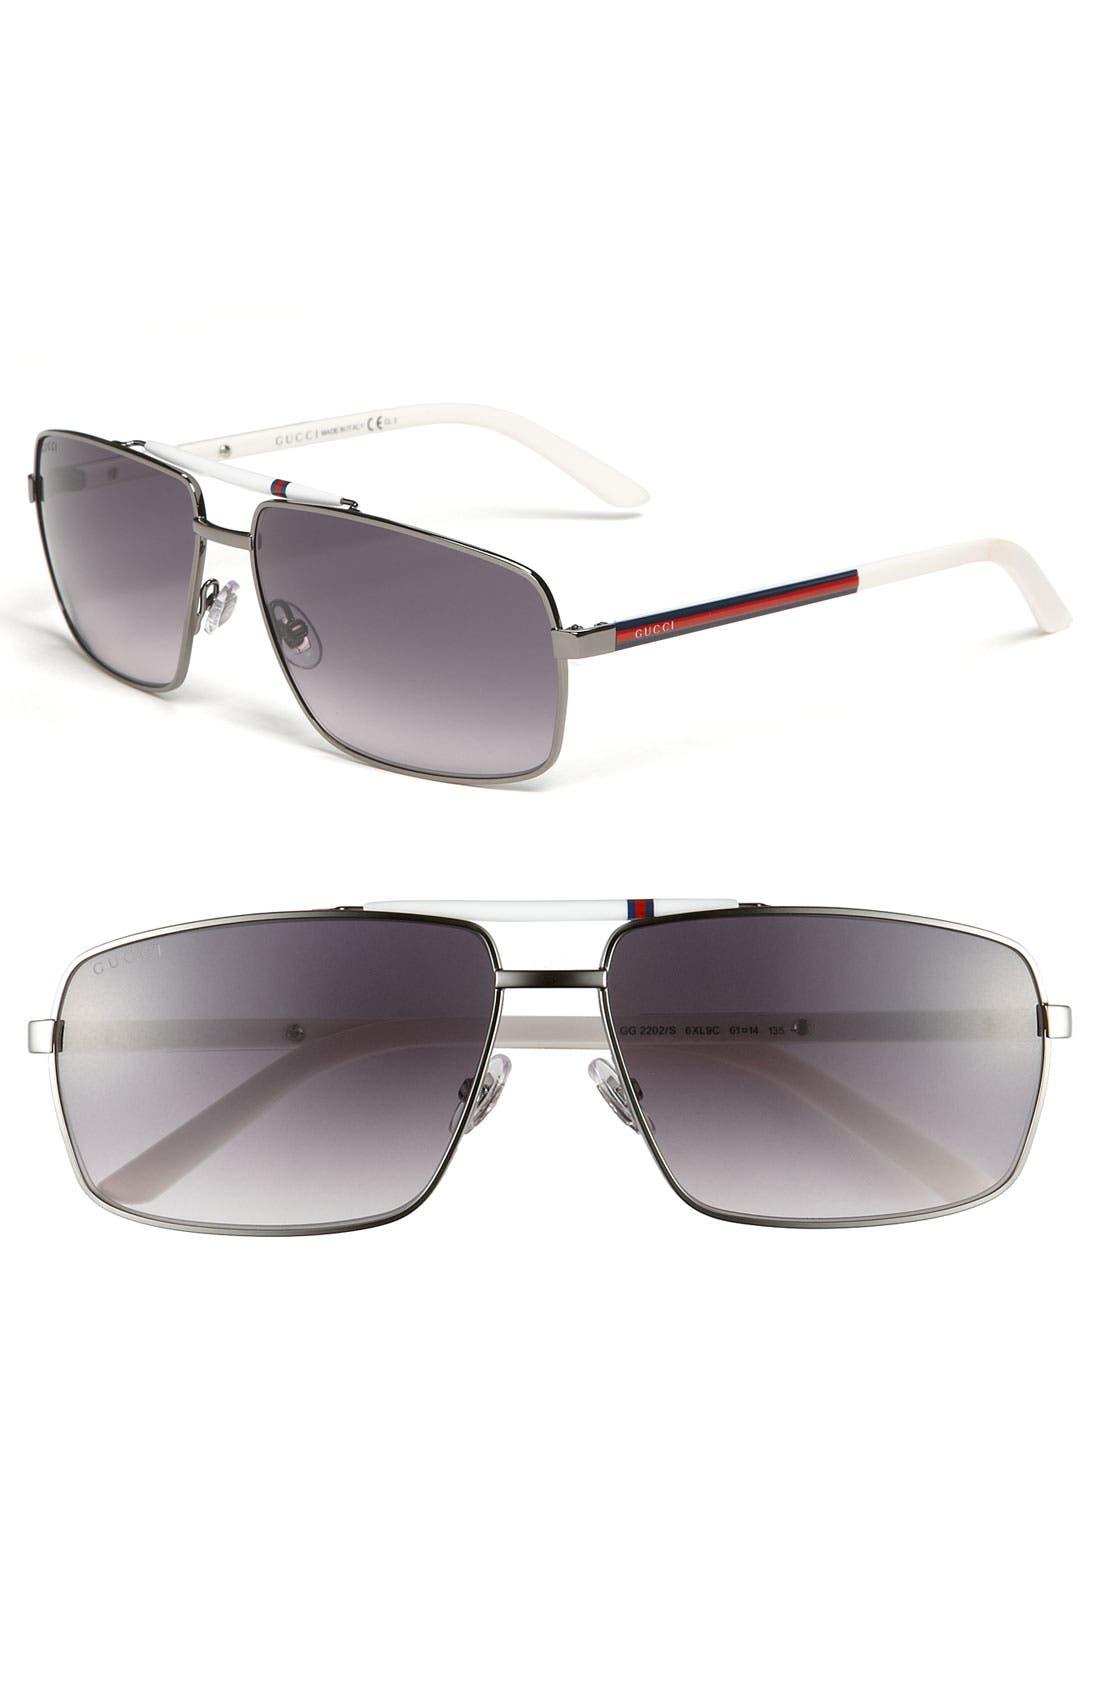 Alternate Image 1 Selected - Gucci 61mm Metal Sunglasses